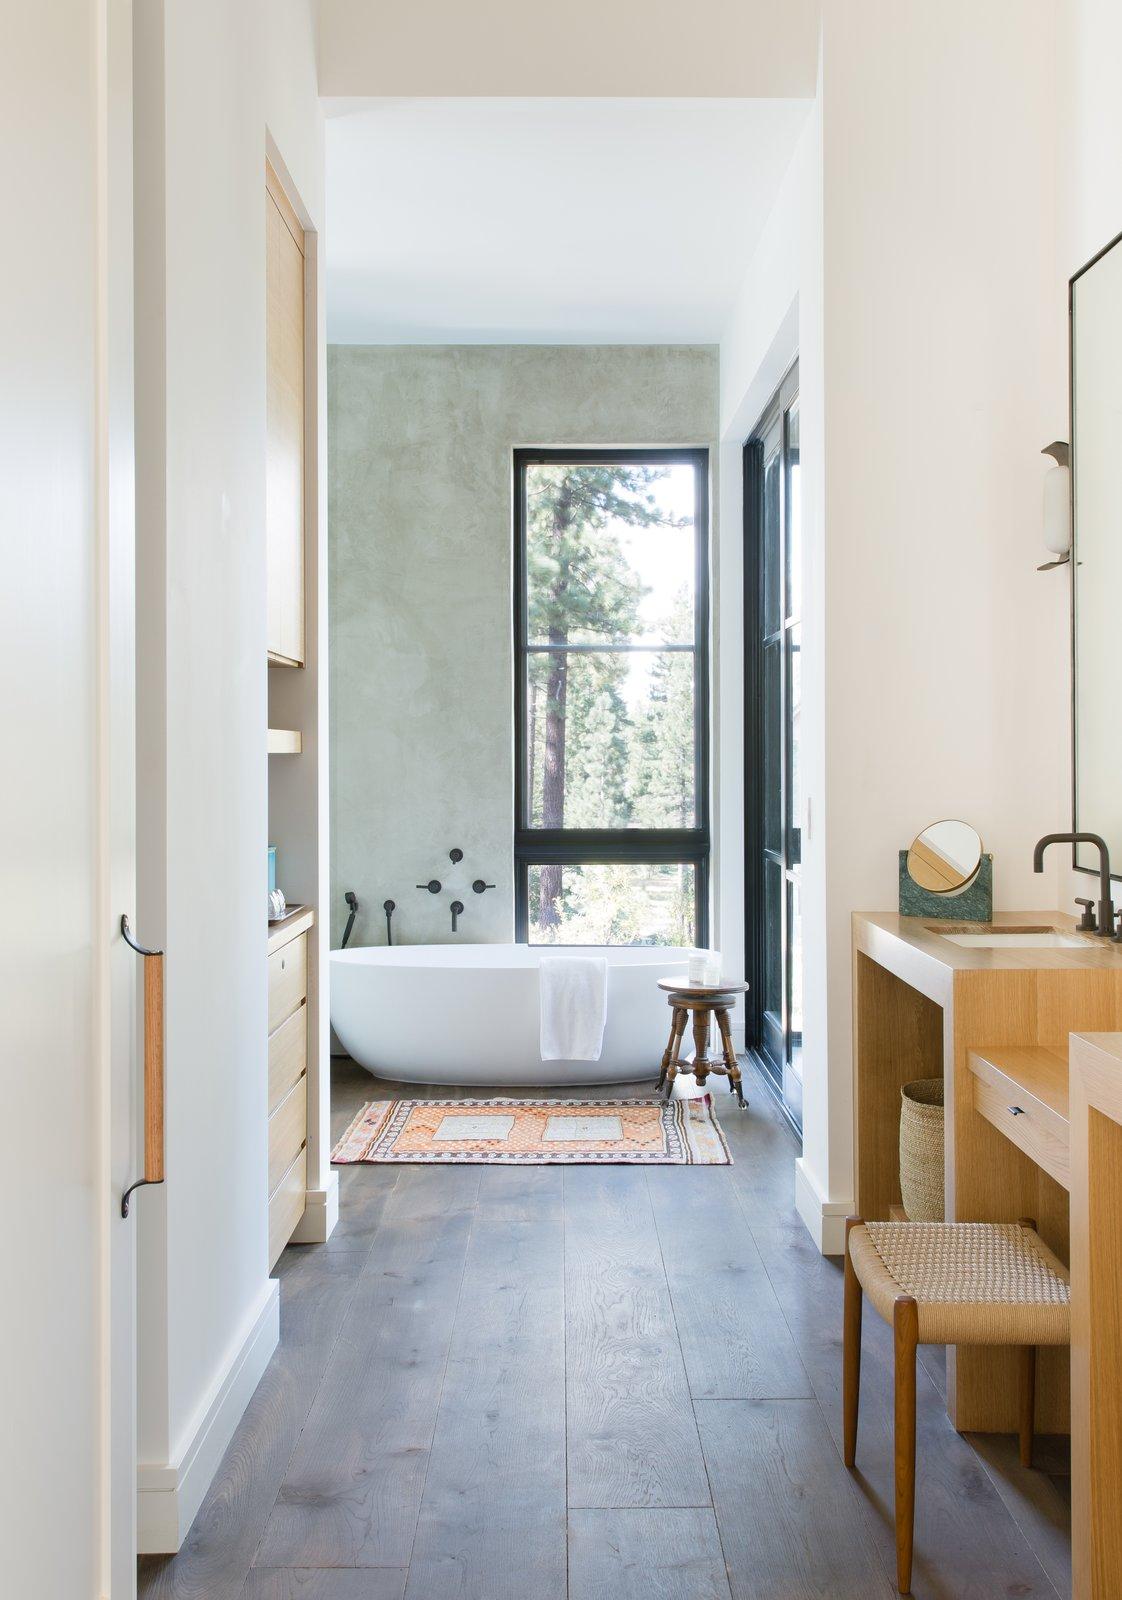 Bath Room, Freestanding Tub, Medium Hardwood Floor, and Wood Counter A peek into the master bath.  Photo 19 of 20 in A Sleek Lake Tahoe Retreat Shows Off an Impressive Art Collection